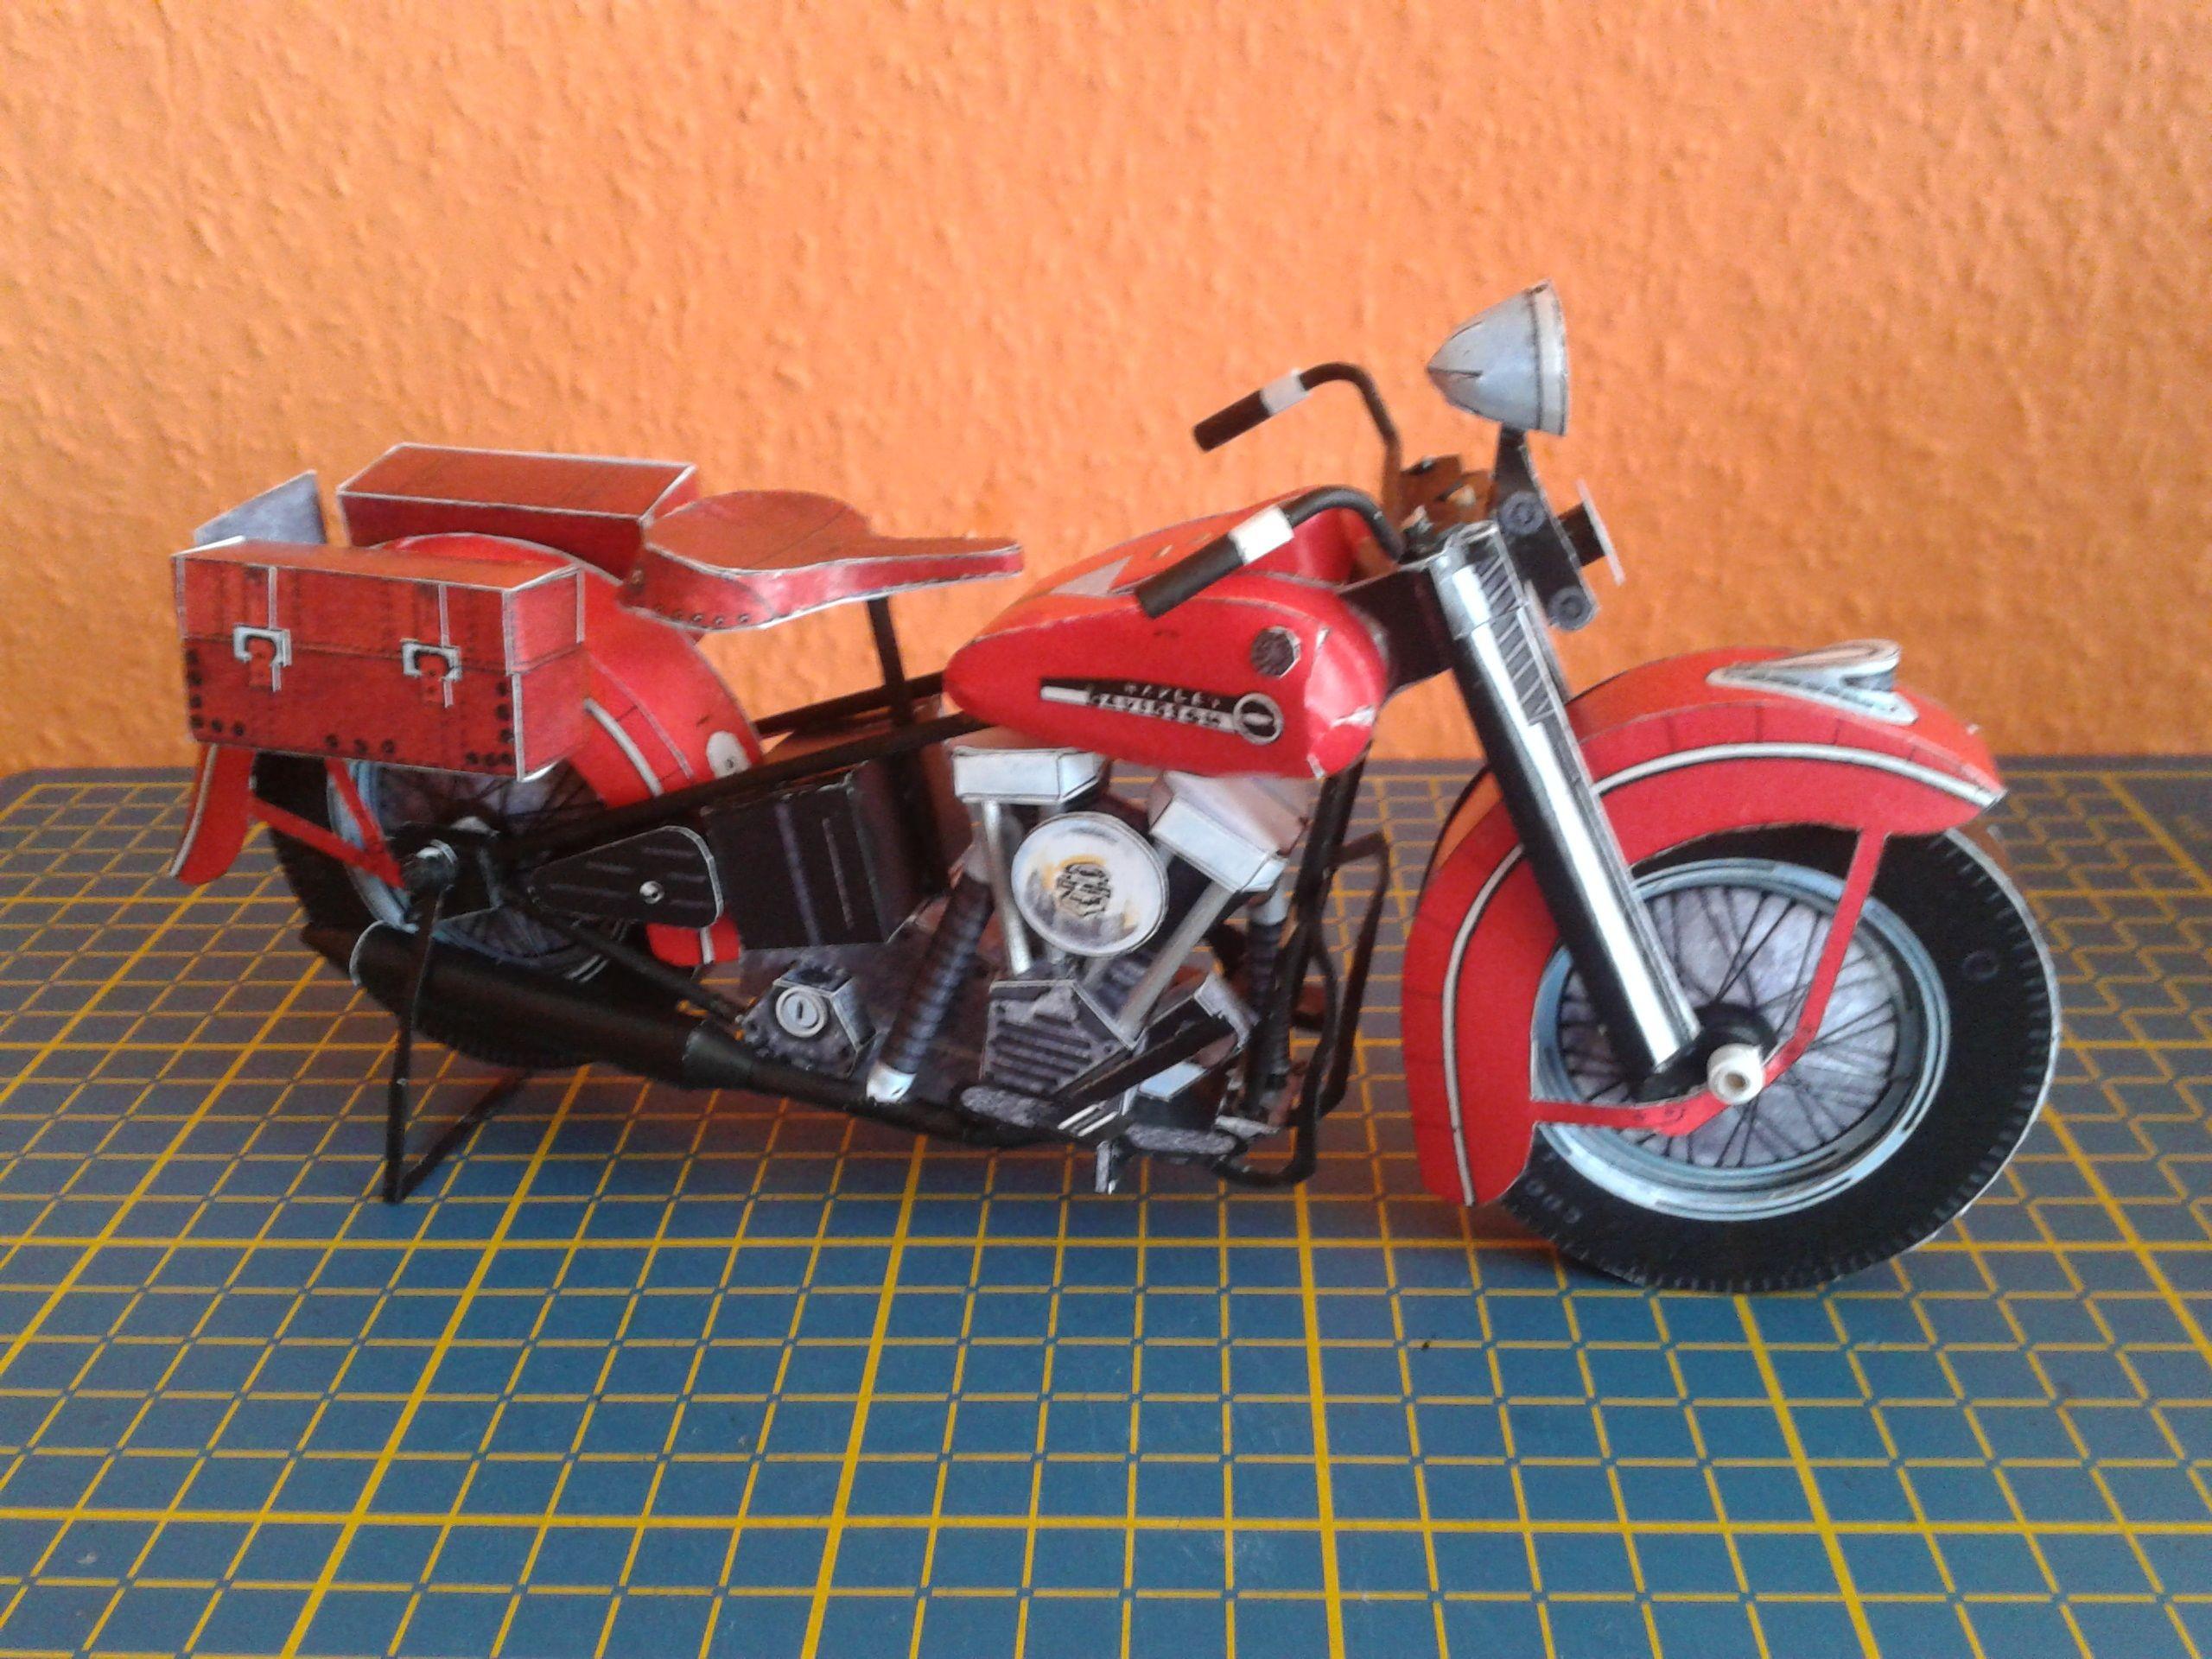 Papercraft Yamaha Yamaha Papercraft Yamaha Yz450f 450 °f = 232 °c Motorcycle Free